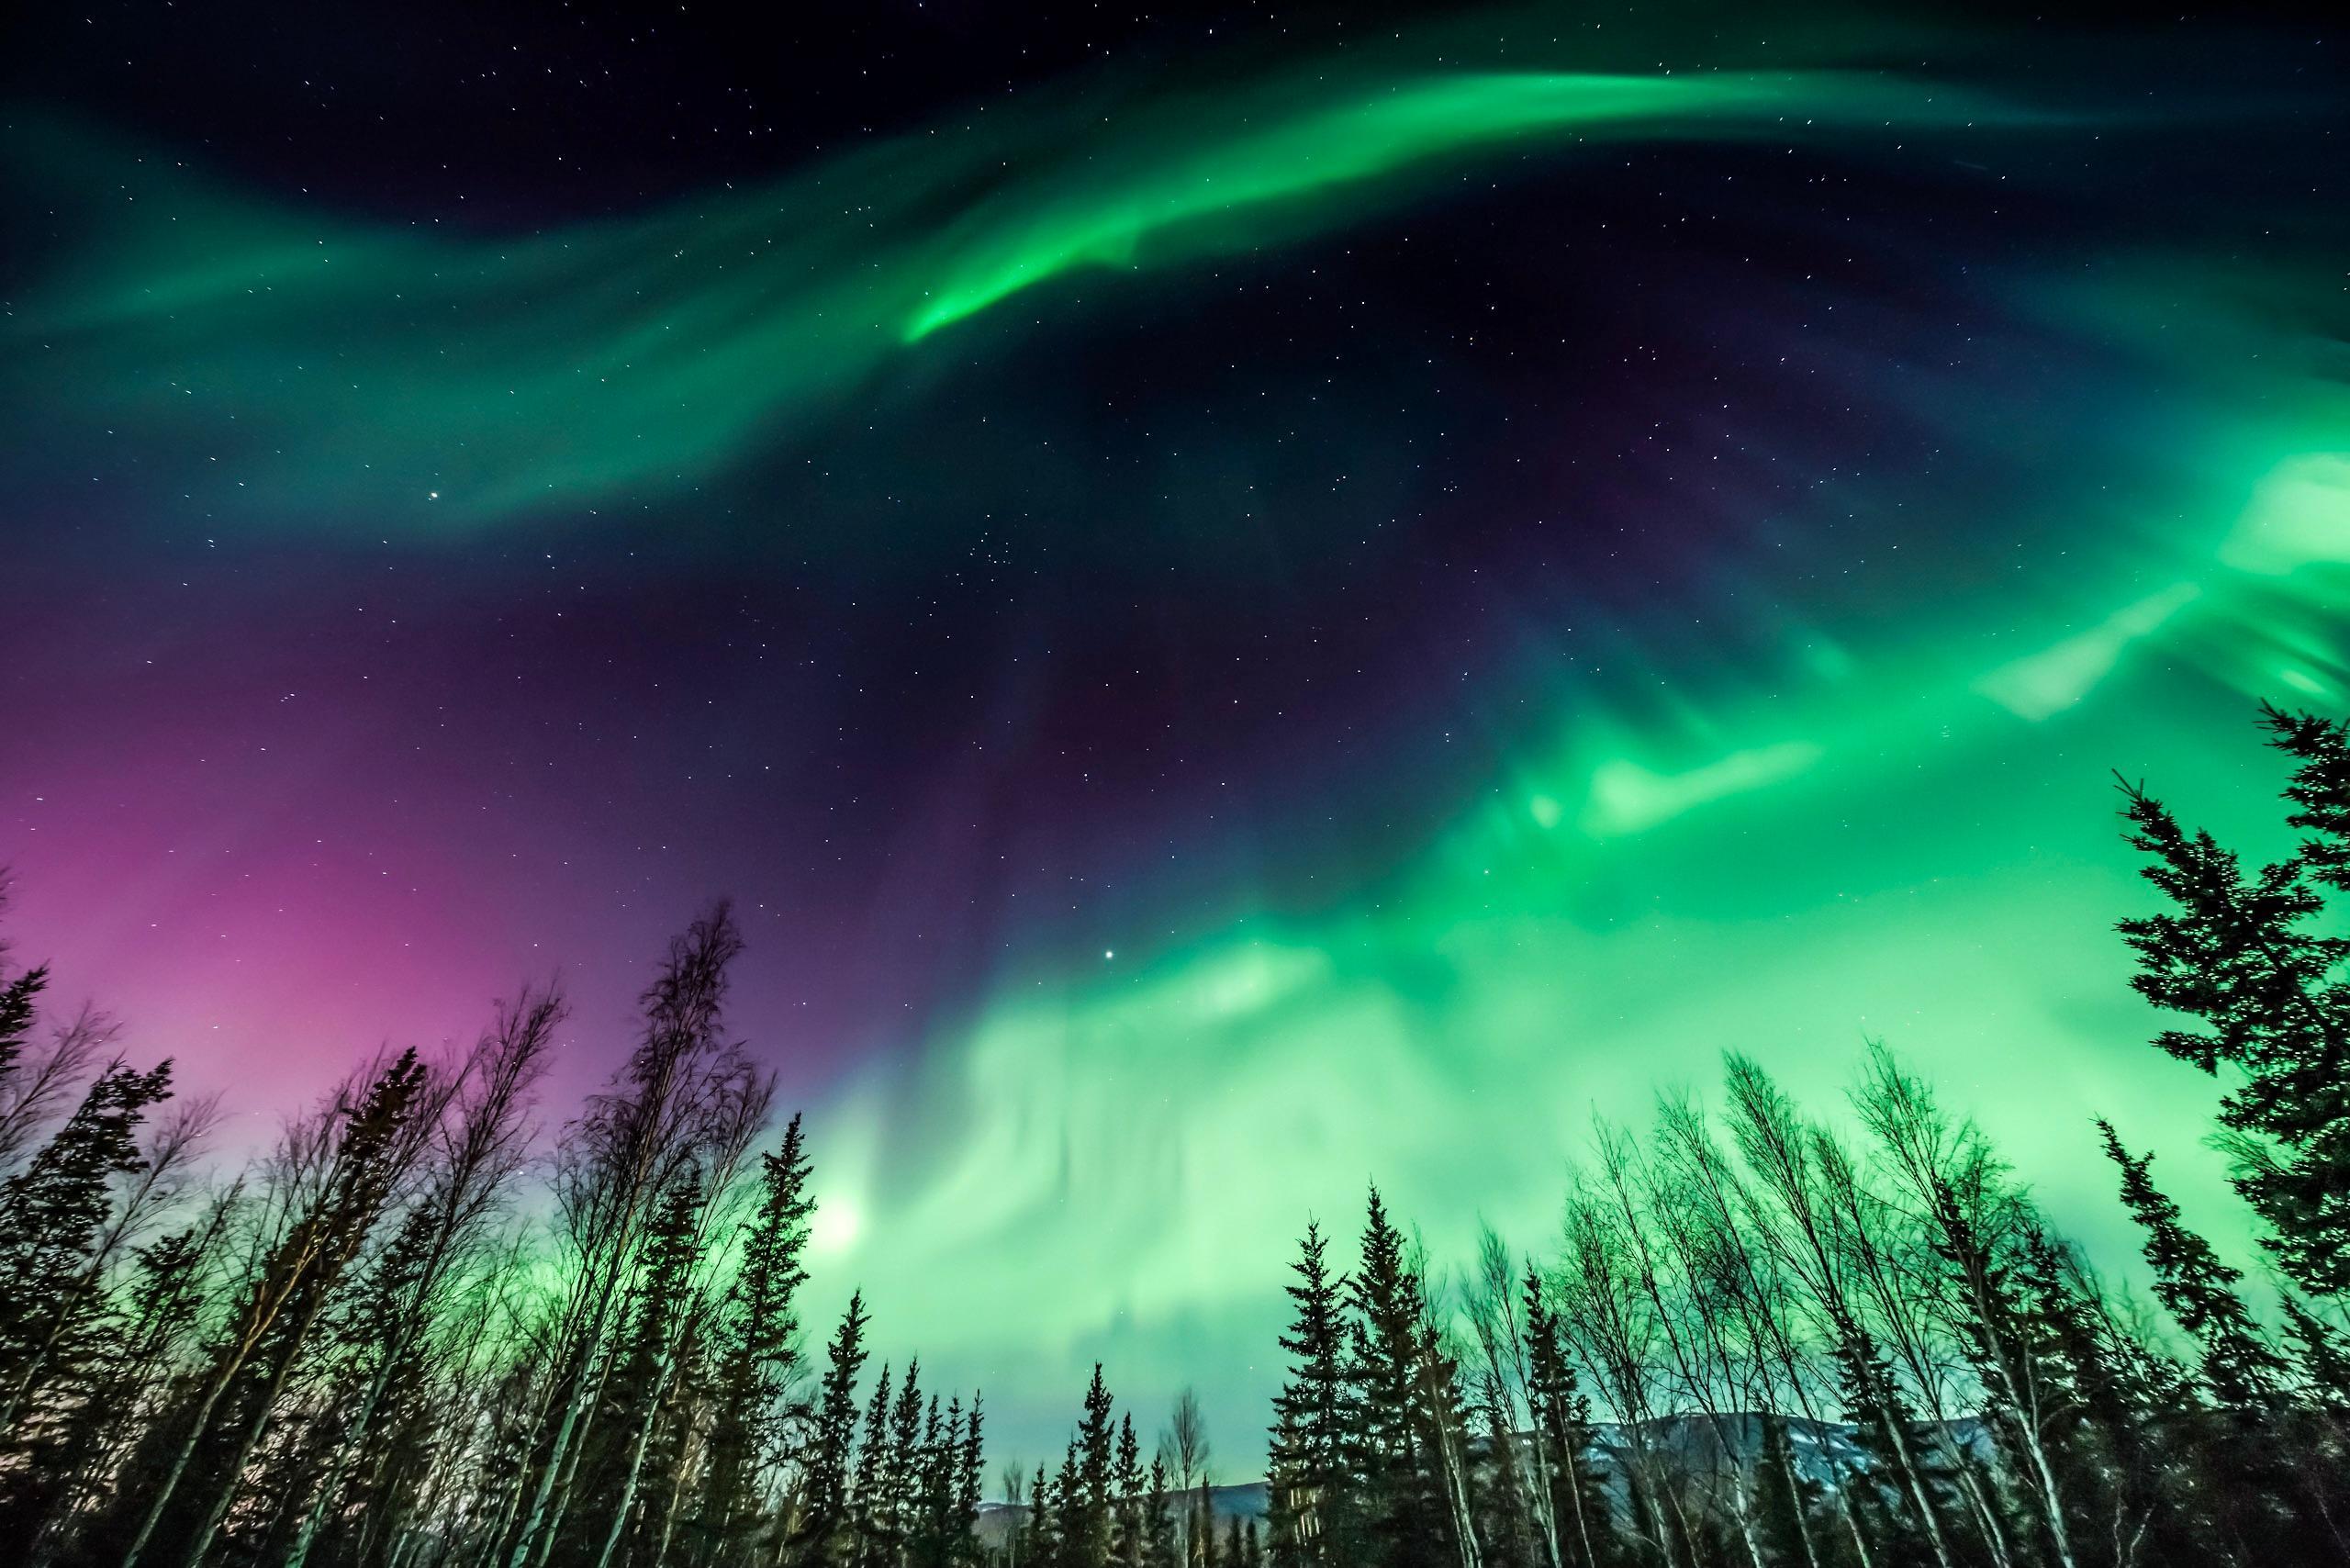 Northern Lights Sweden 2019 Best places for